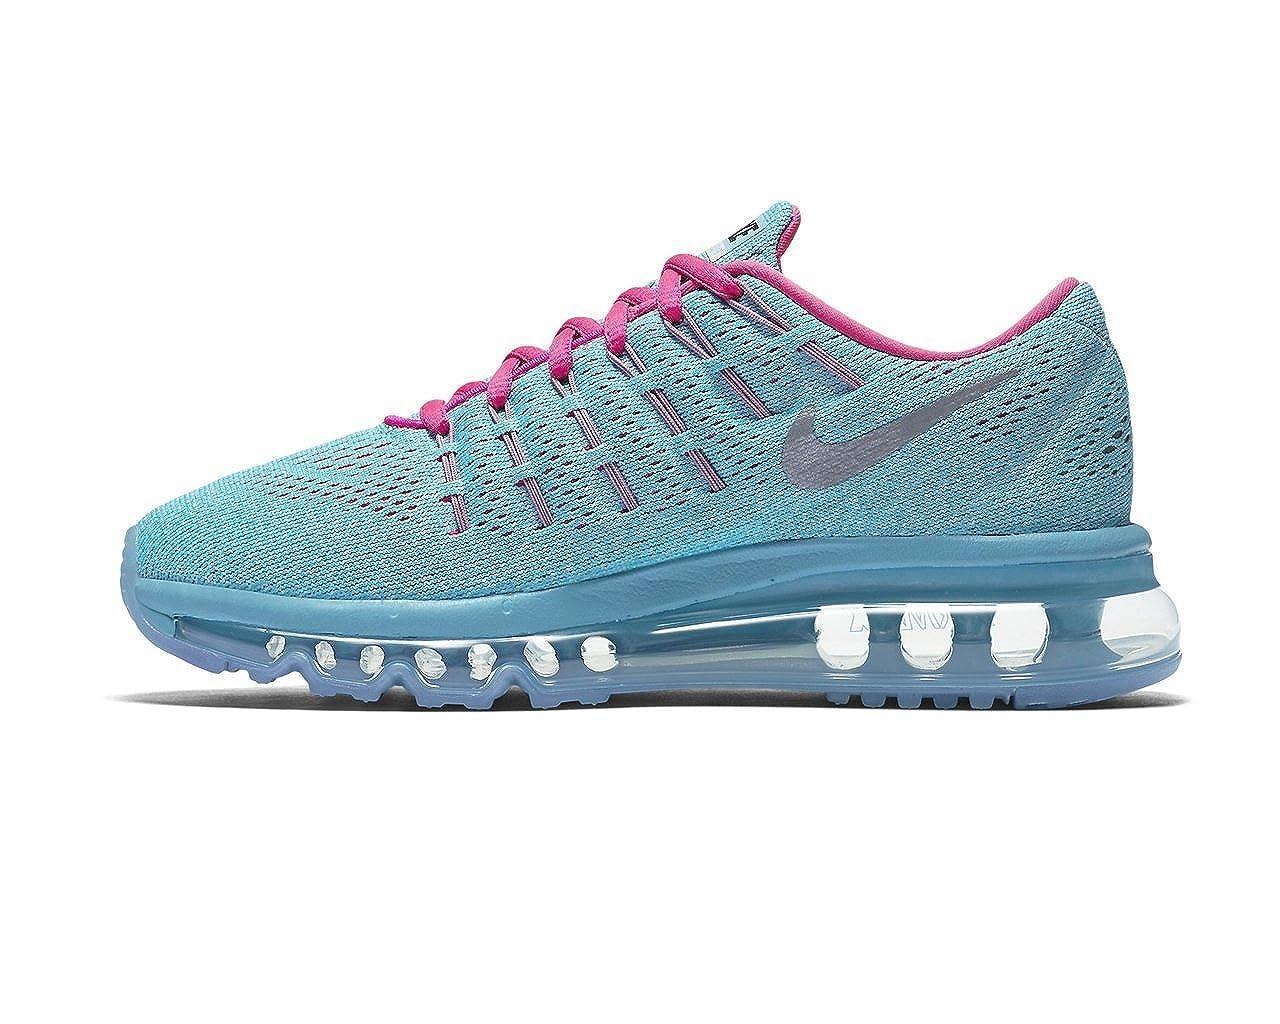 en soldes 5d9f6 12799 NIKE Air Max 2016 (GS), Chaussures de Running Entrainement Fille